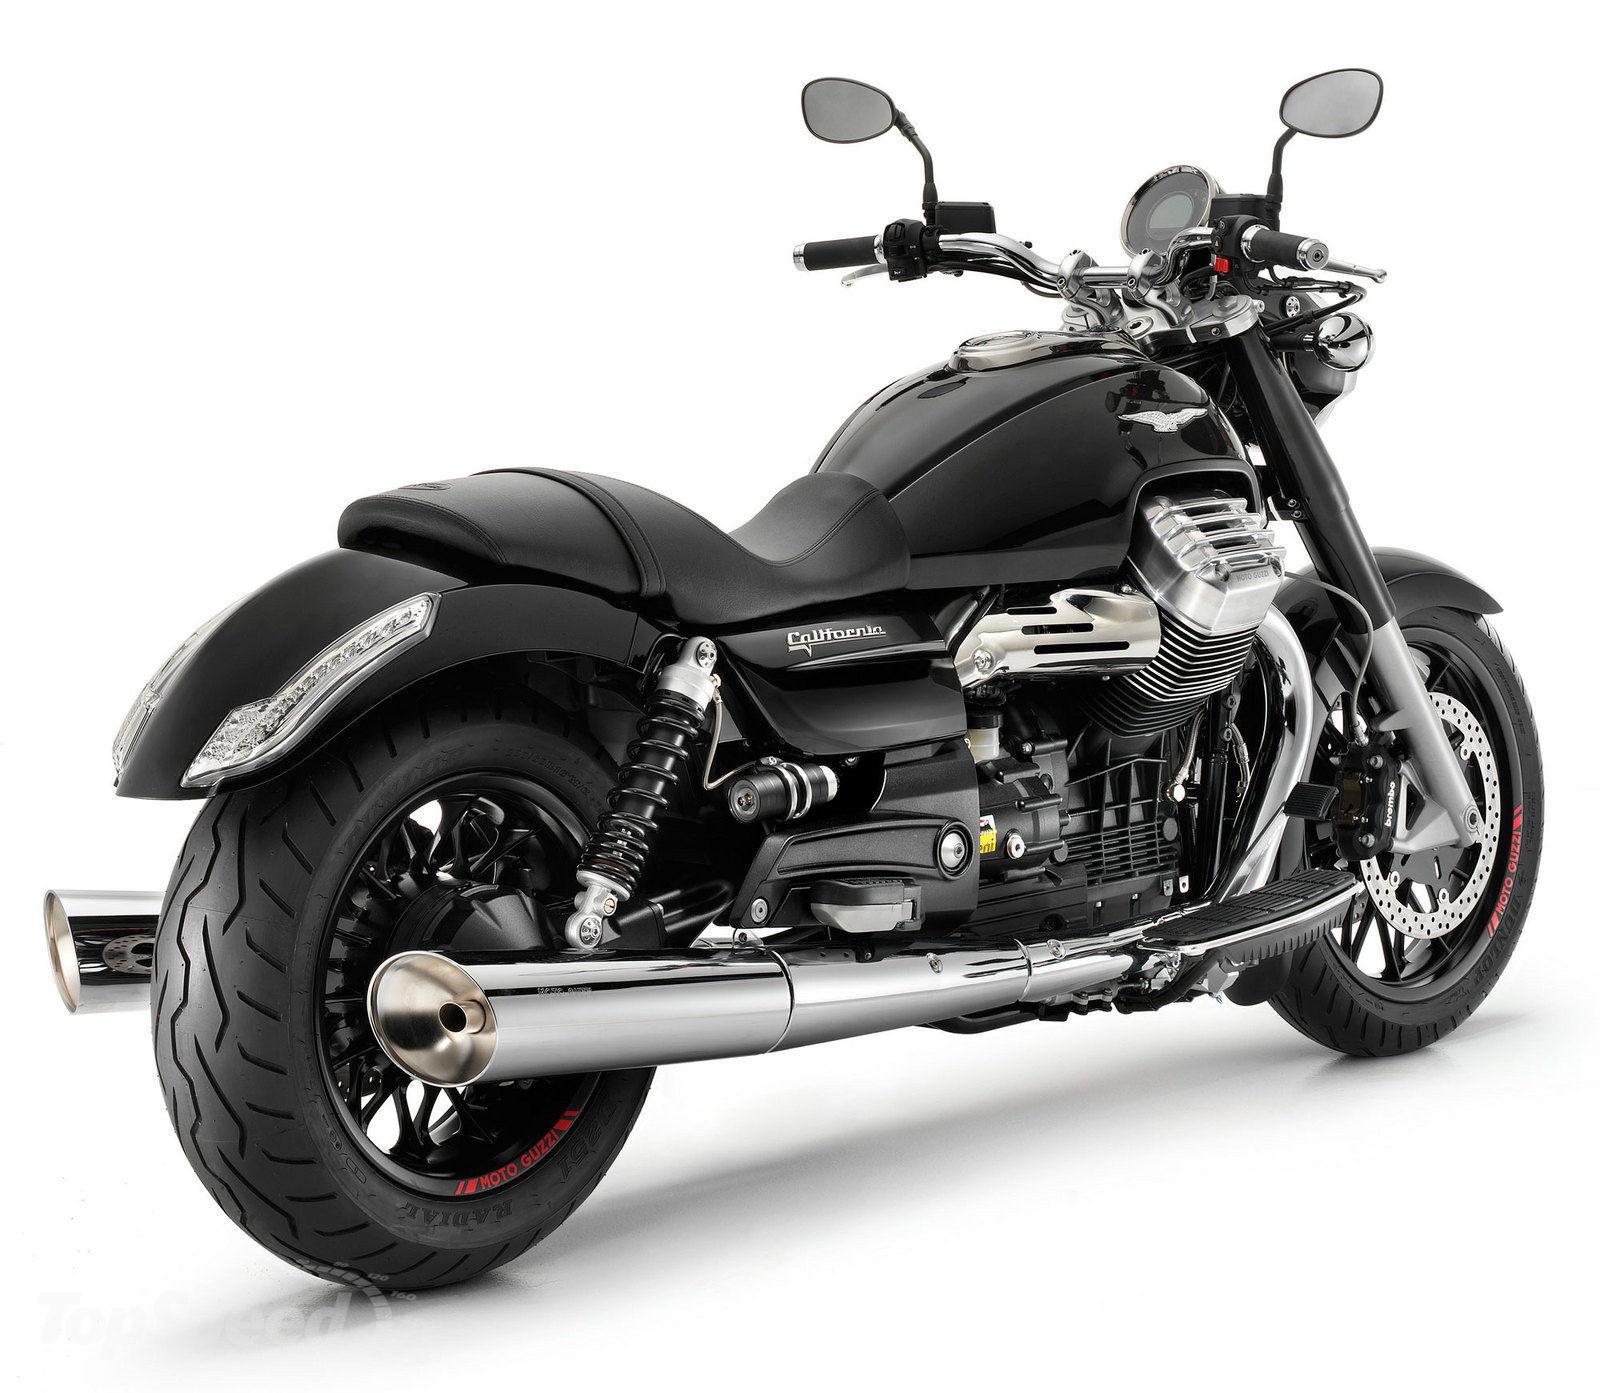 in moto 2013 Moto Guzzi Califórnia 1400 personalizado